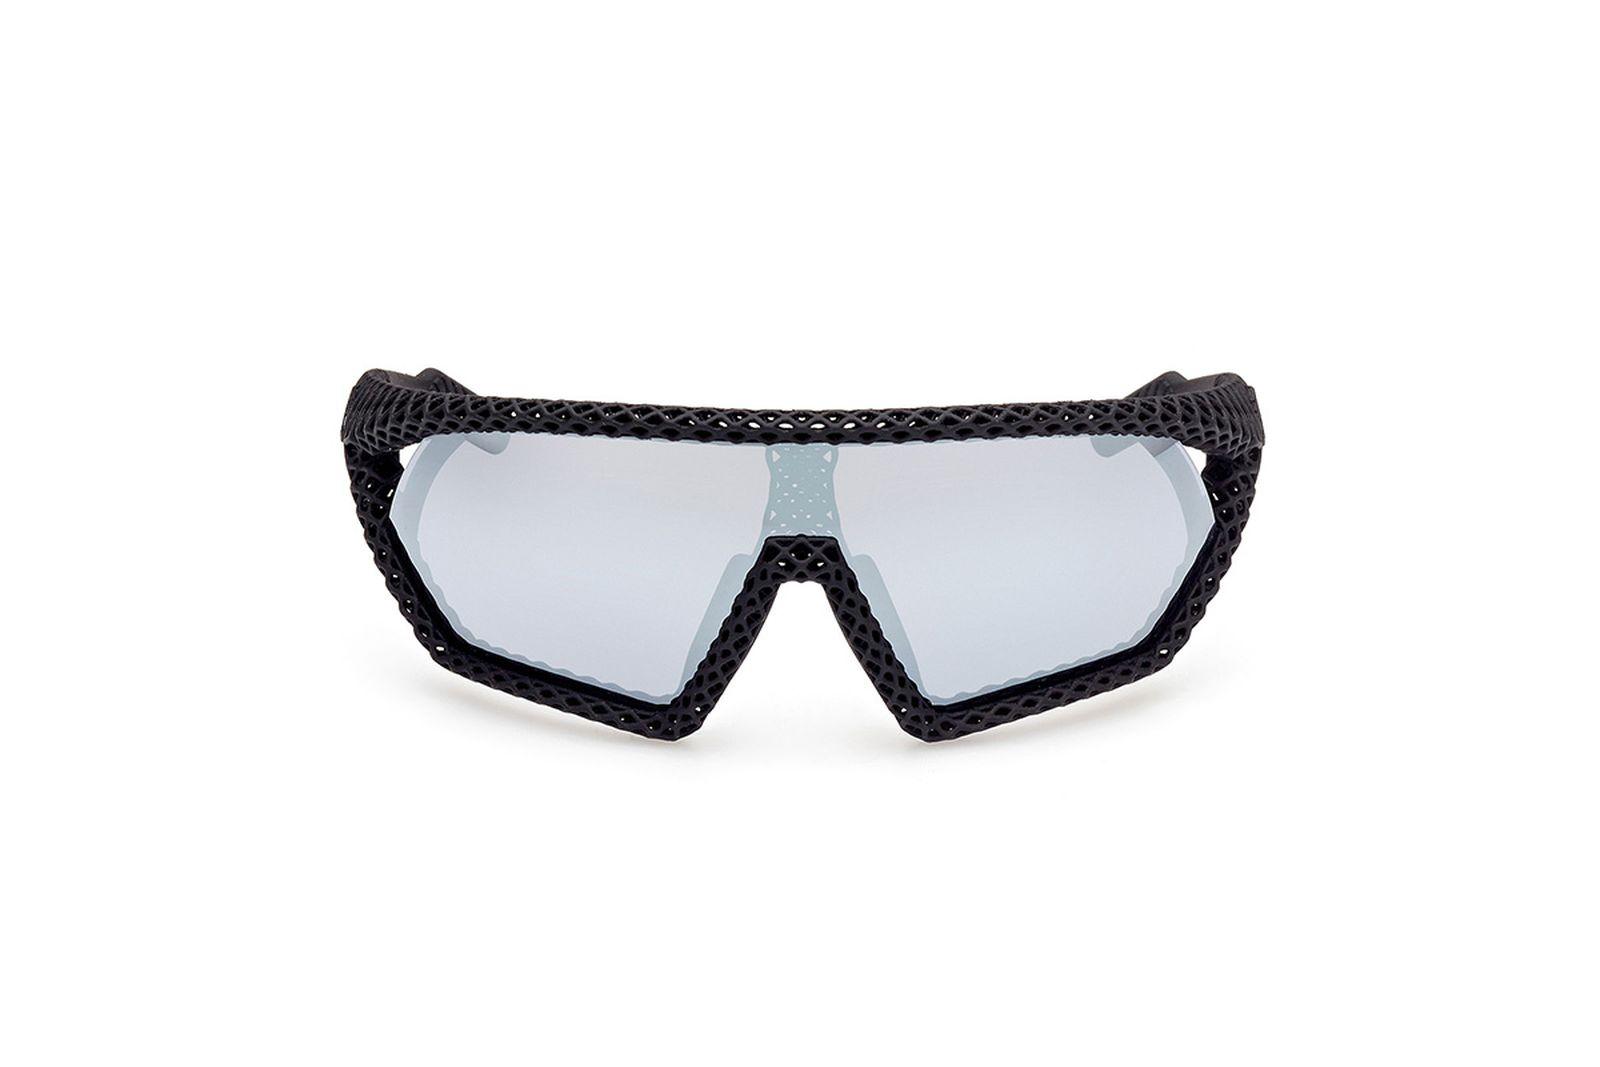 adidas-3d-cmpt-sunglasses-03